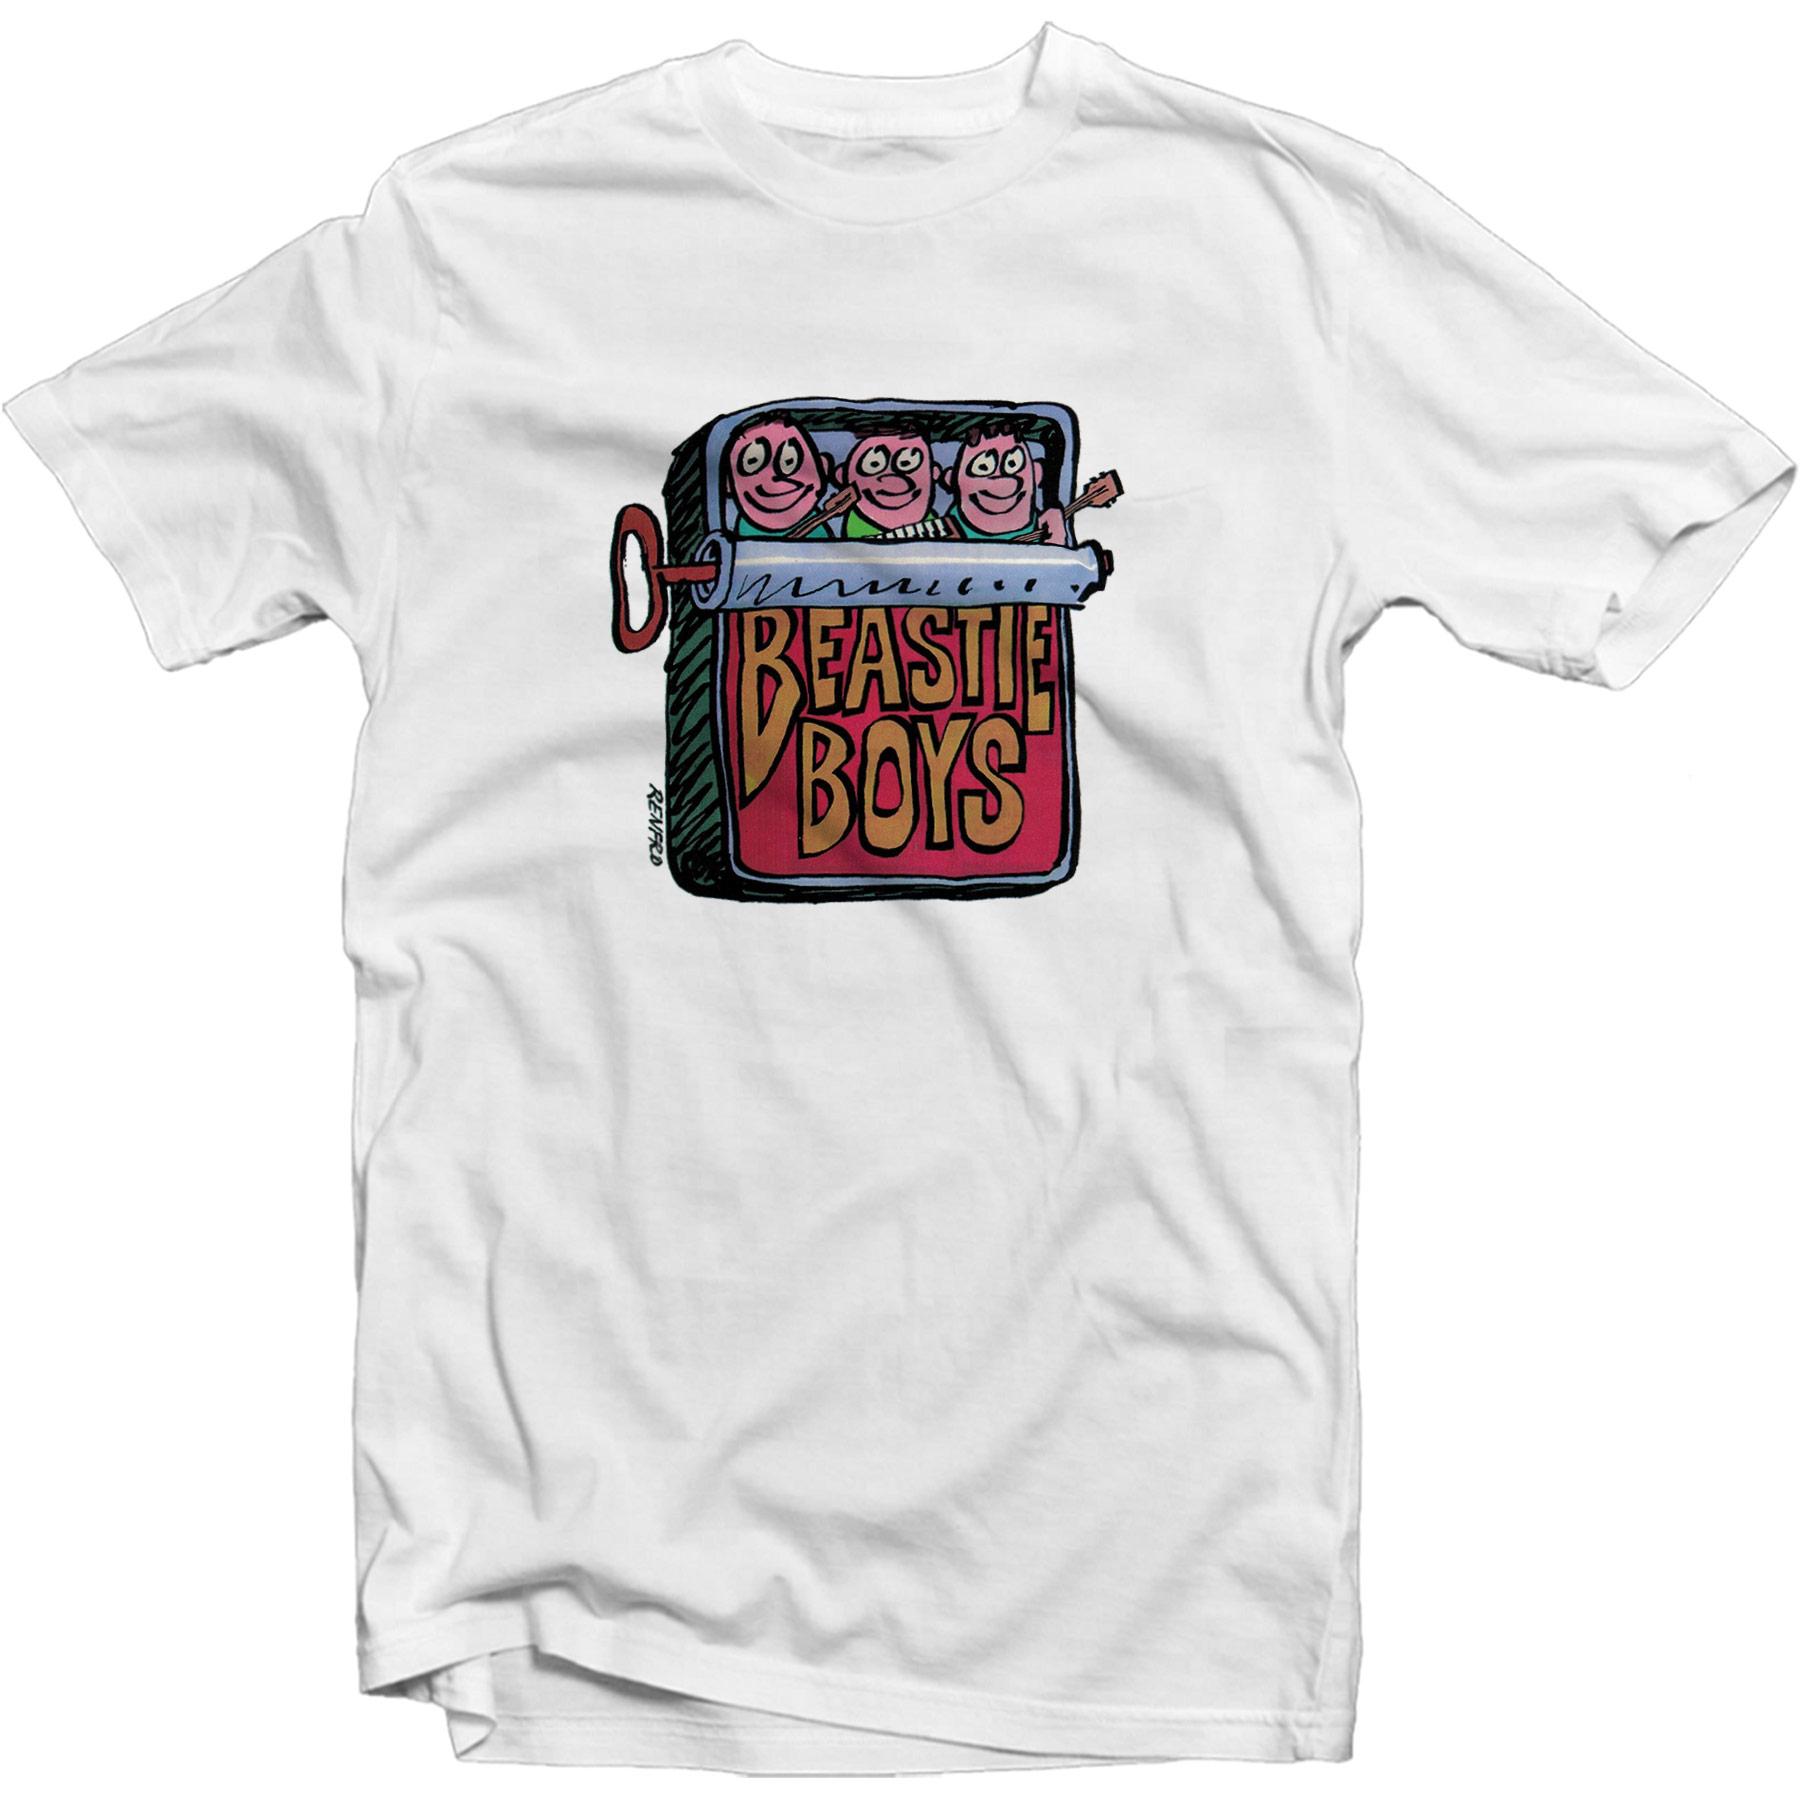 1998 Beastie Boys Hello Nasty Shirt T恤